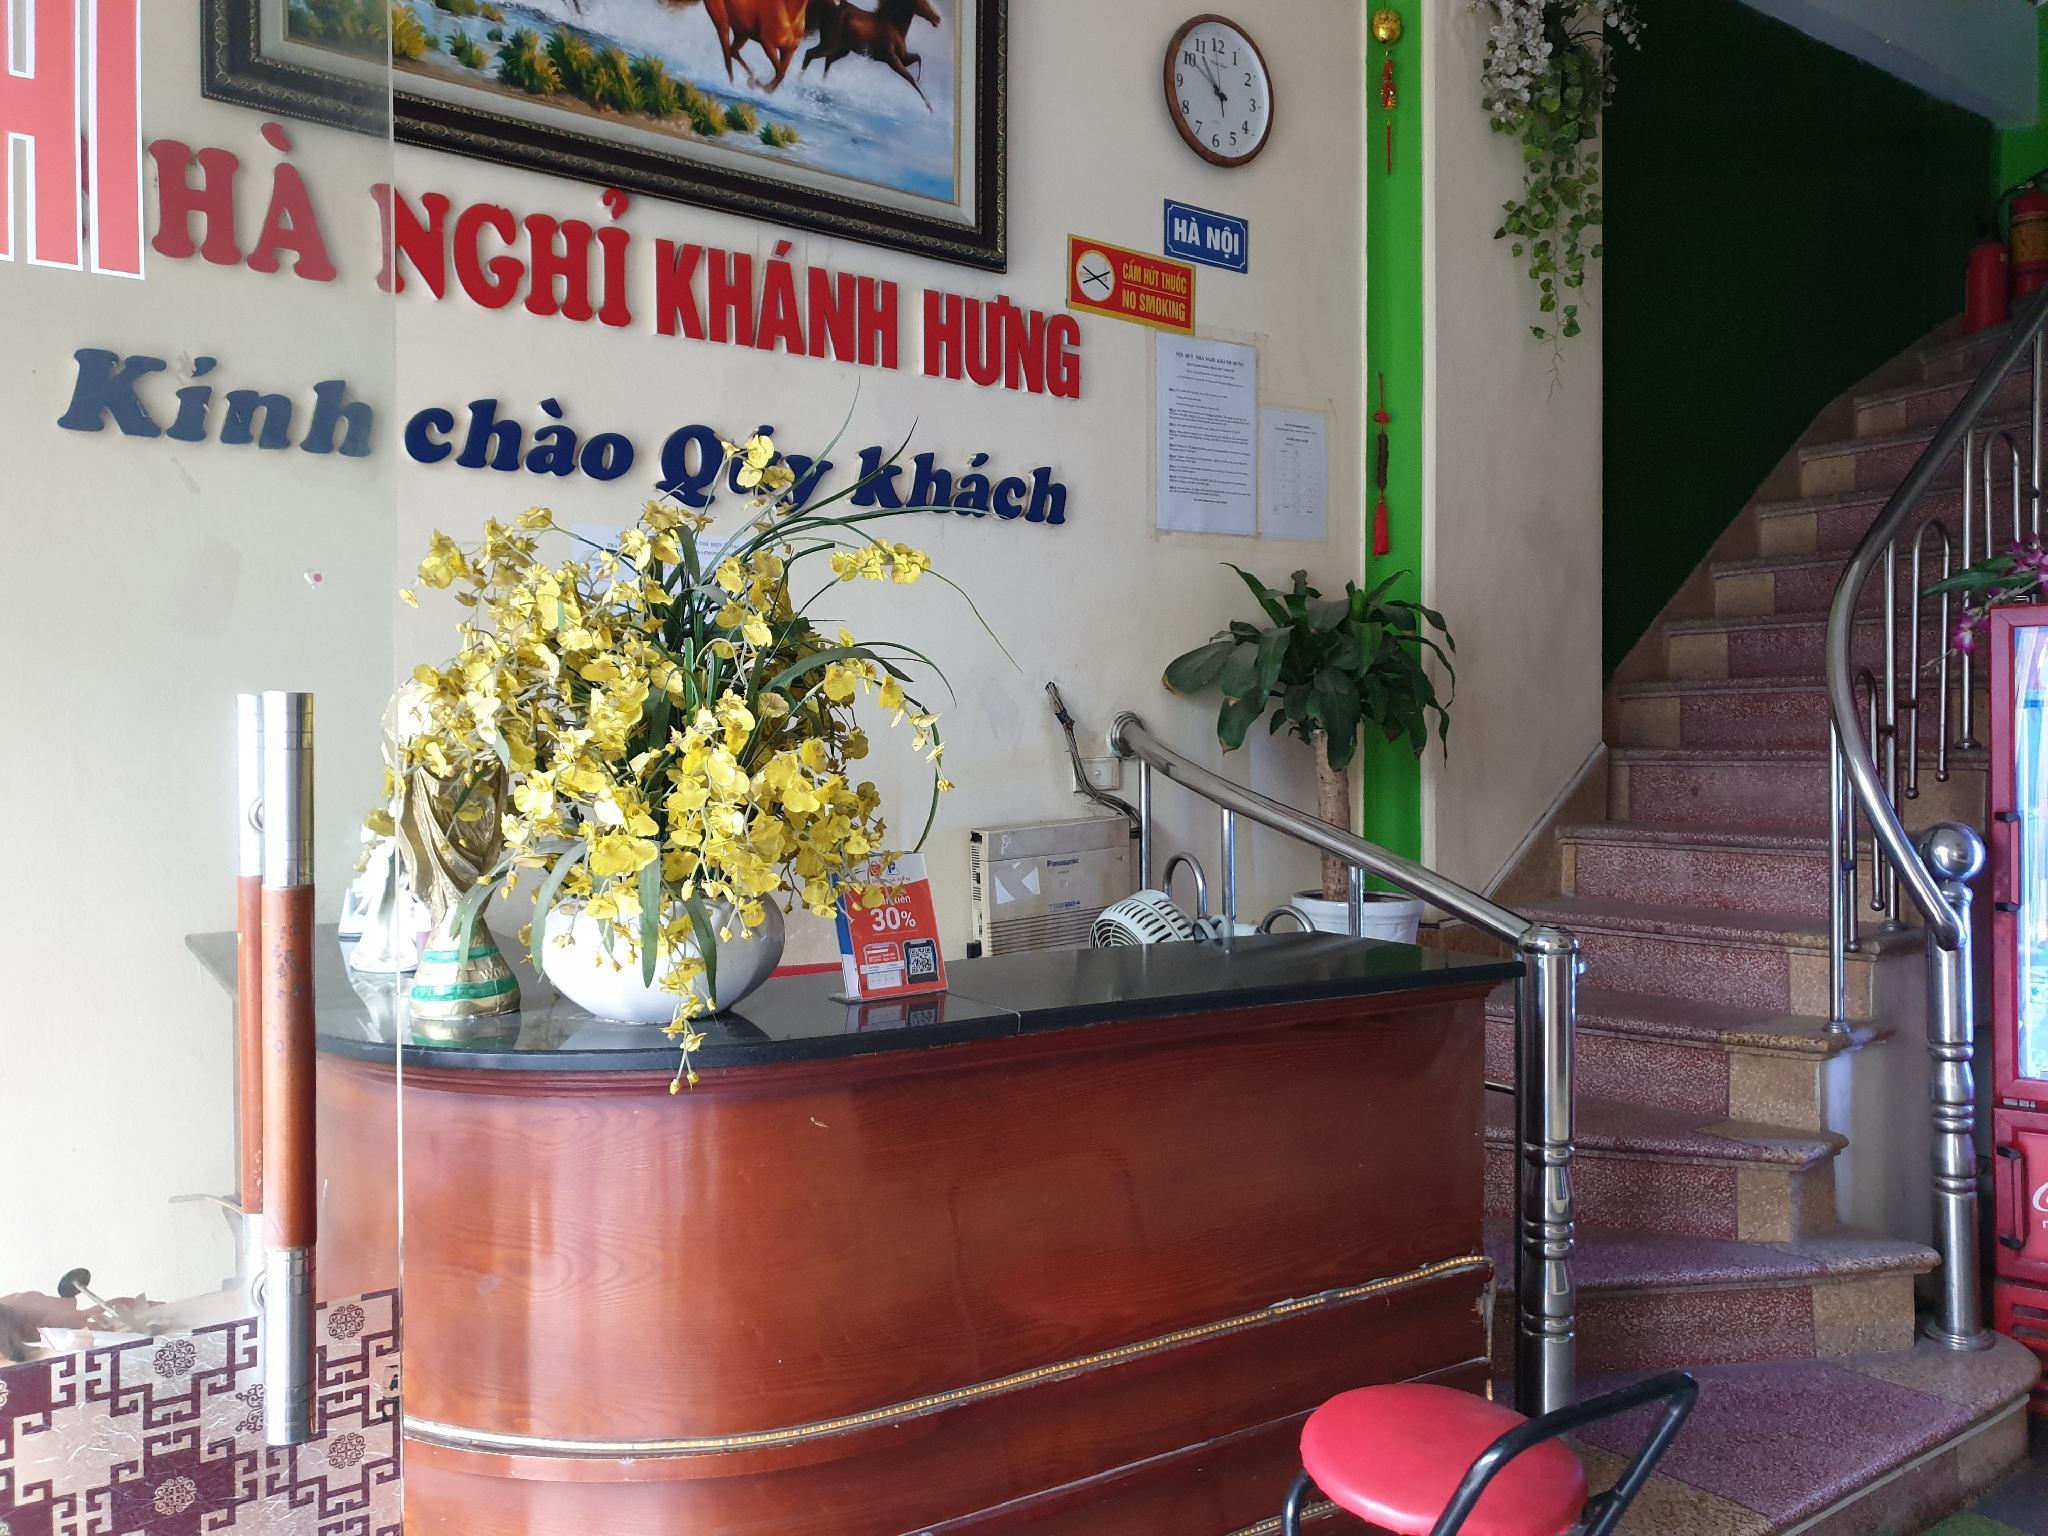 SPOT ON 919 Khanh Hung Motel